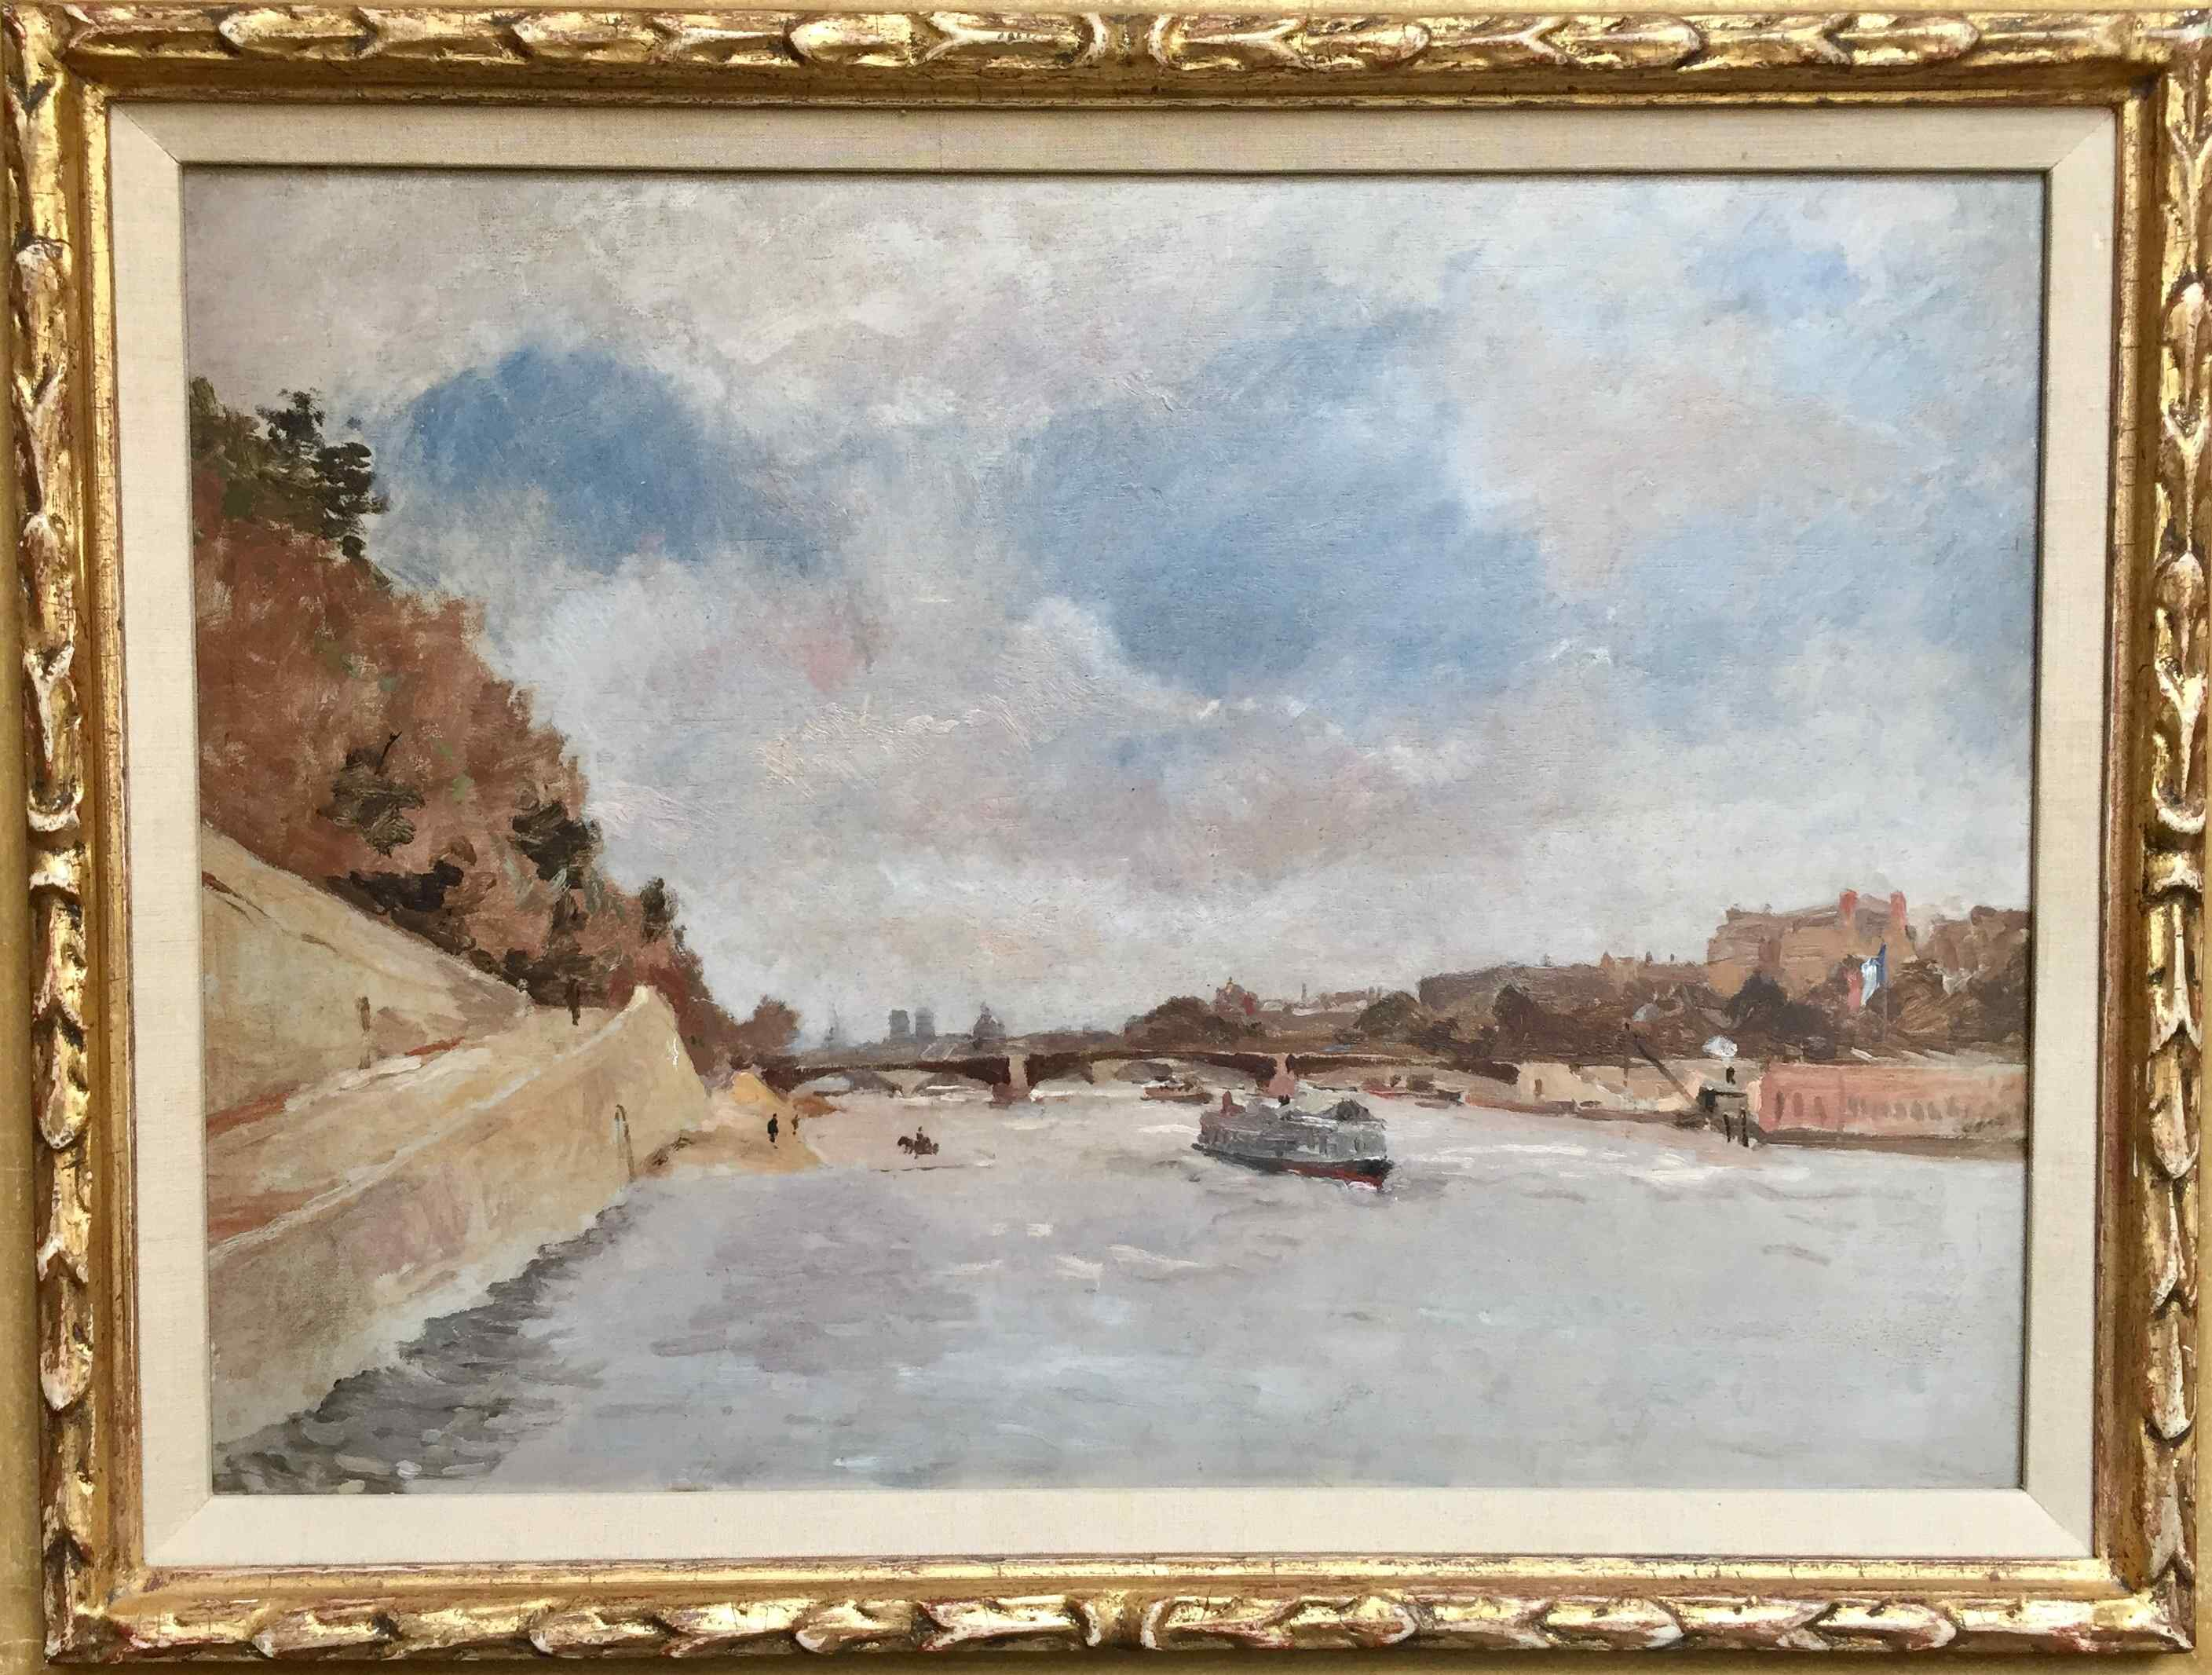 Qanchina di Seine di Frank Boggs, impressionnist americana